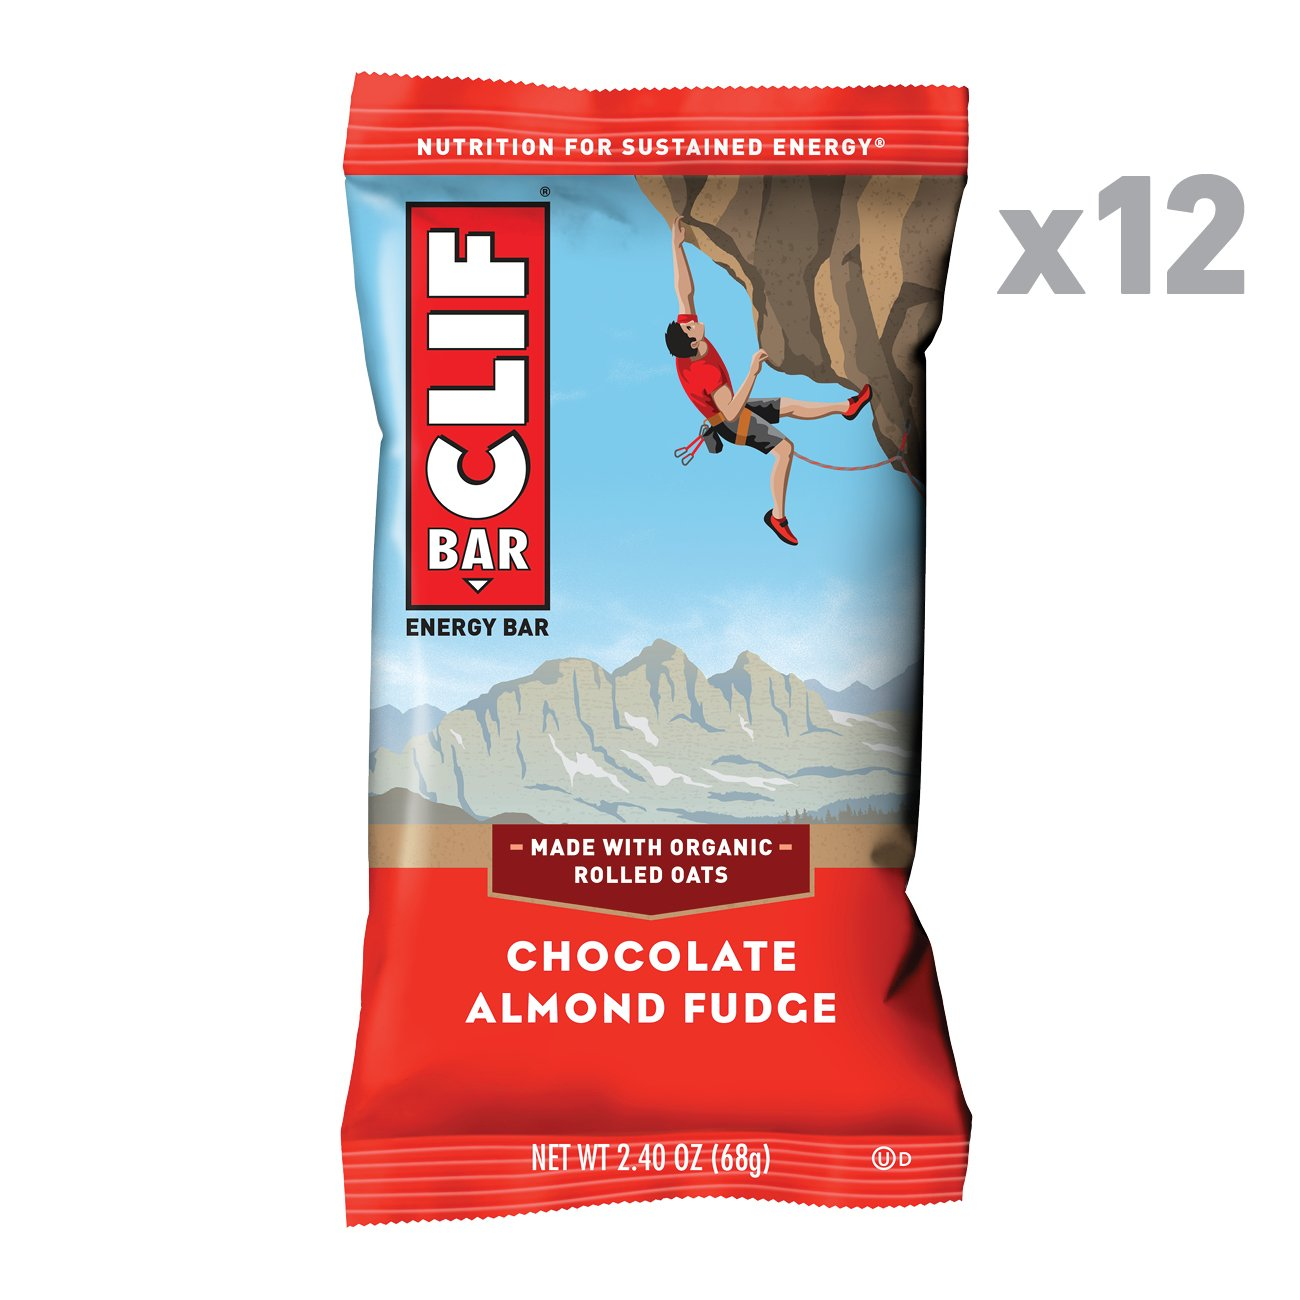 CLIF BAR - Energy Bar - Chocolate Almond Fudge - (2.4 Ounce Protein Bar, 12 Count)